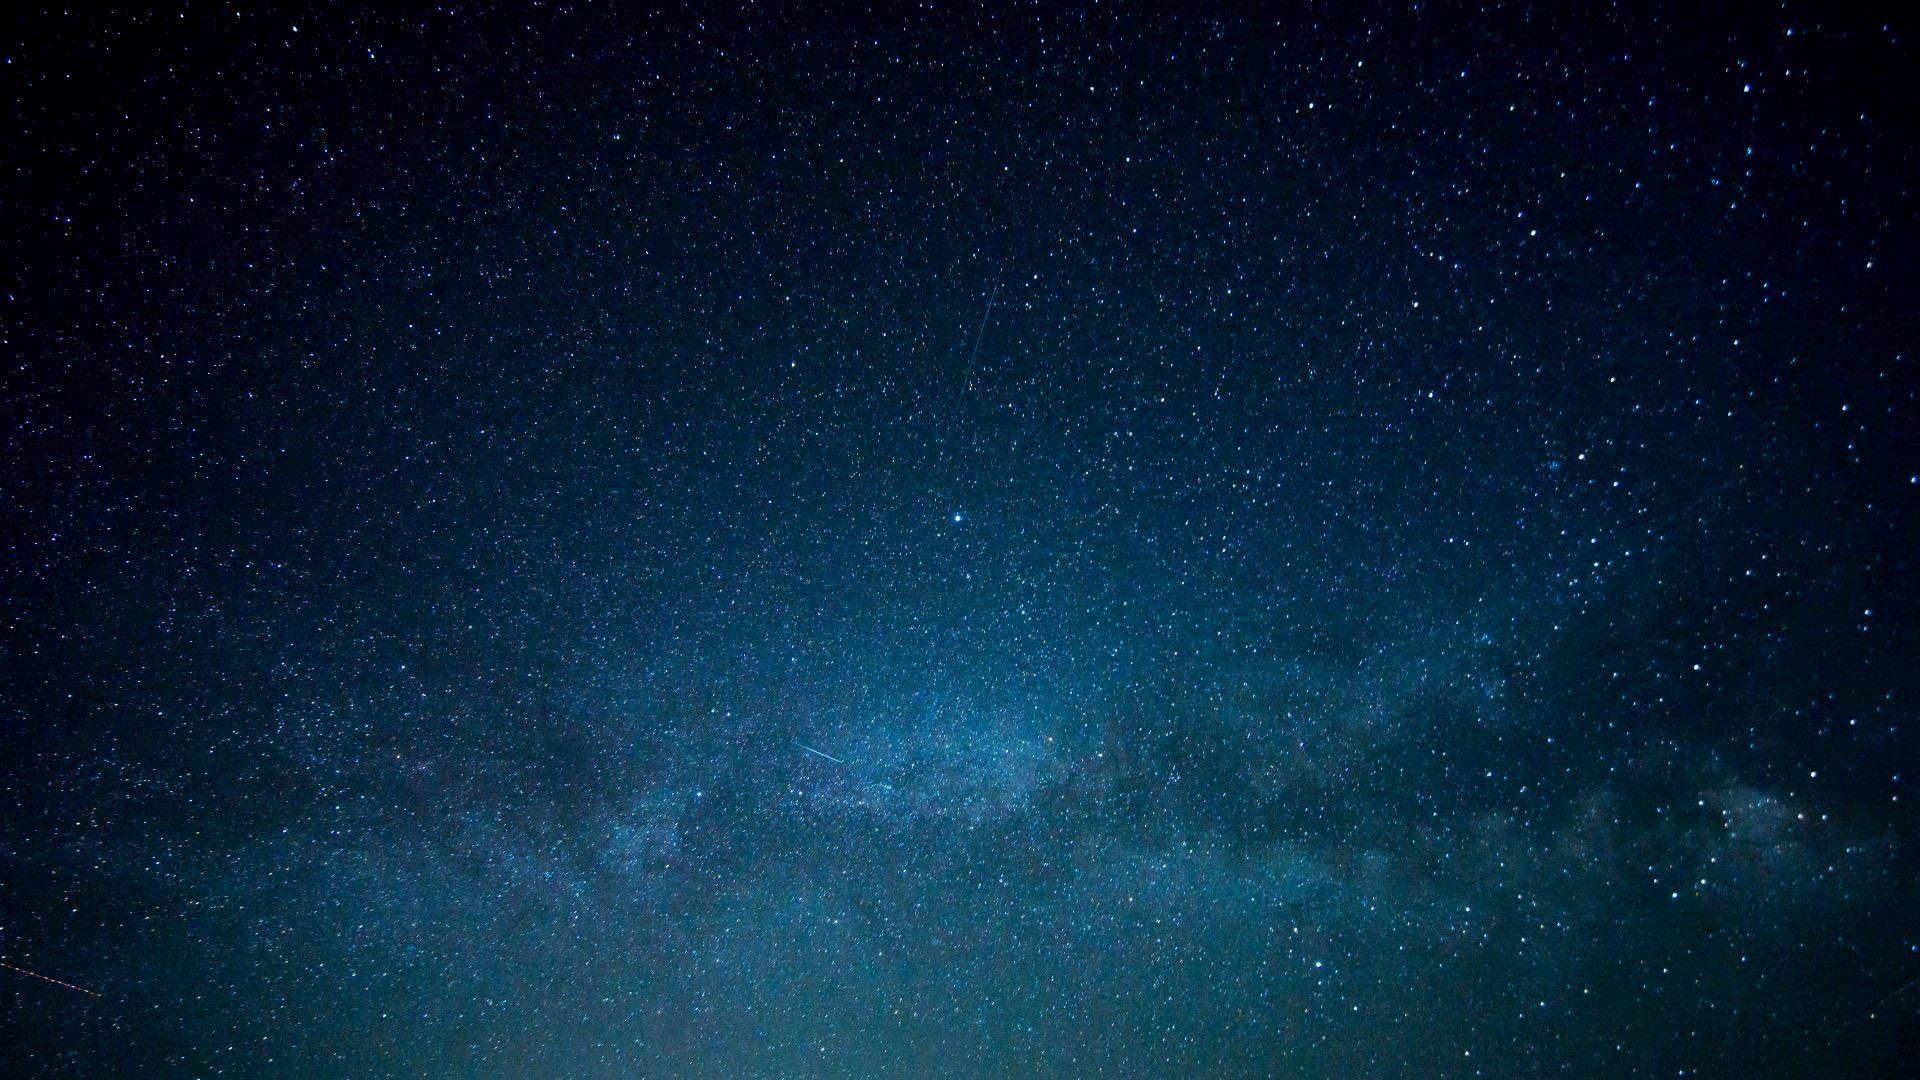 Wallpaper stars galaxy space blue 1920x1080 - Blue space galaxy wallpaper ...